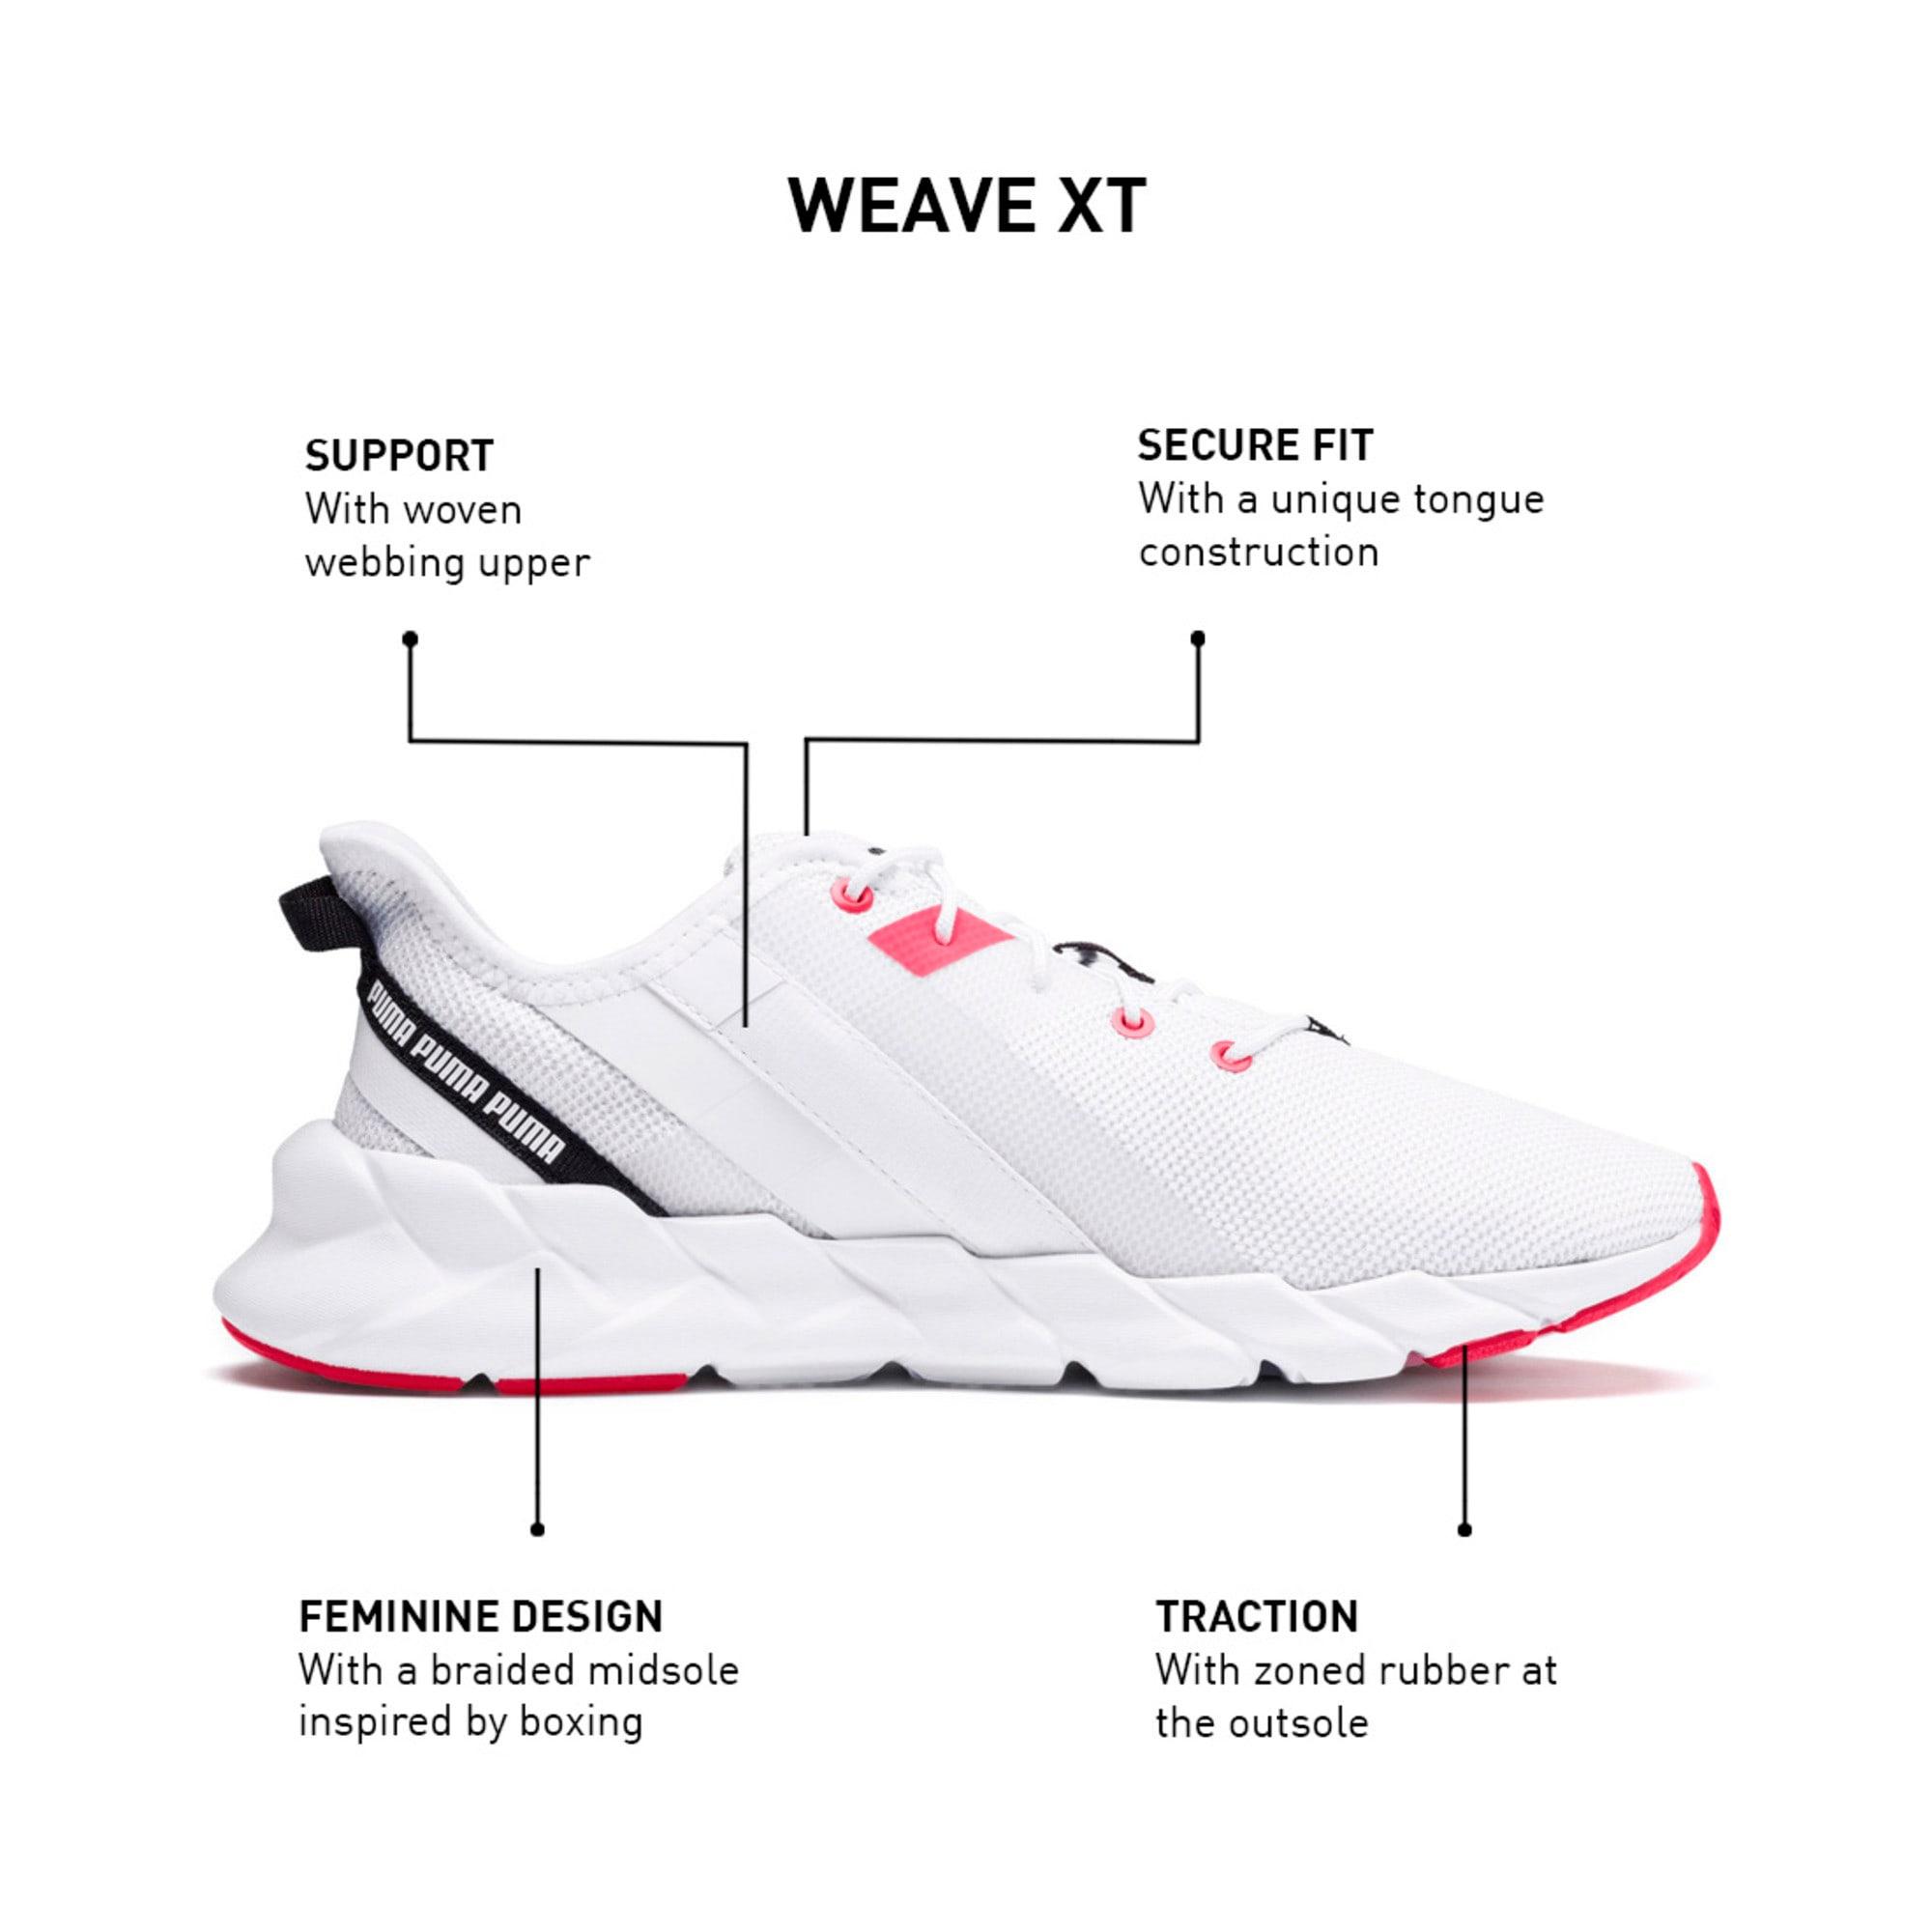 Thumbnail 10 of Weave XT Women's Training Shoes, Puma White-Pink Alert, medium-IND